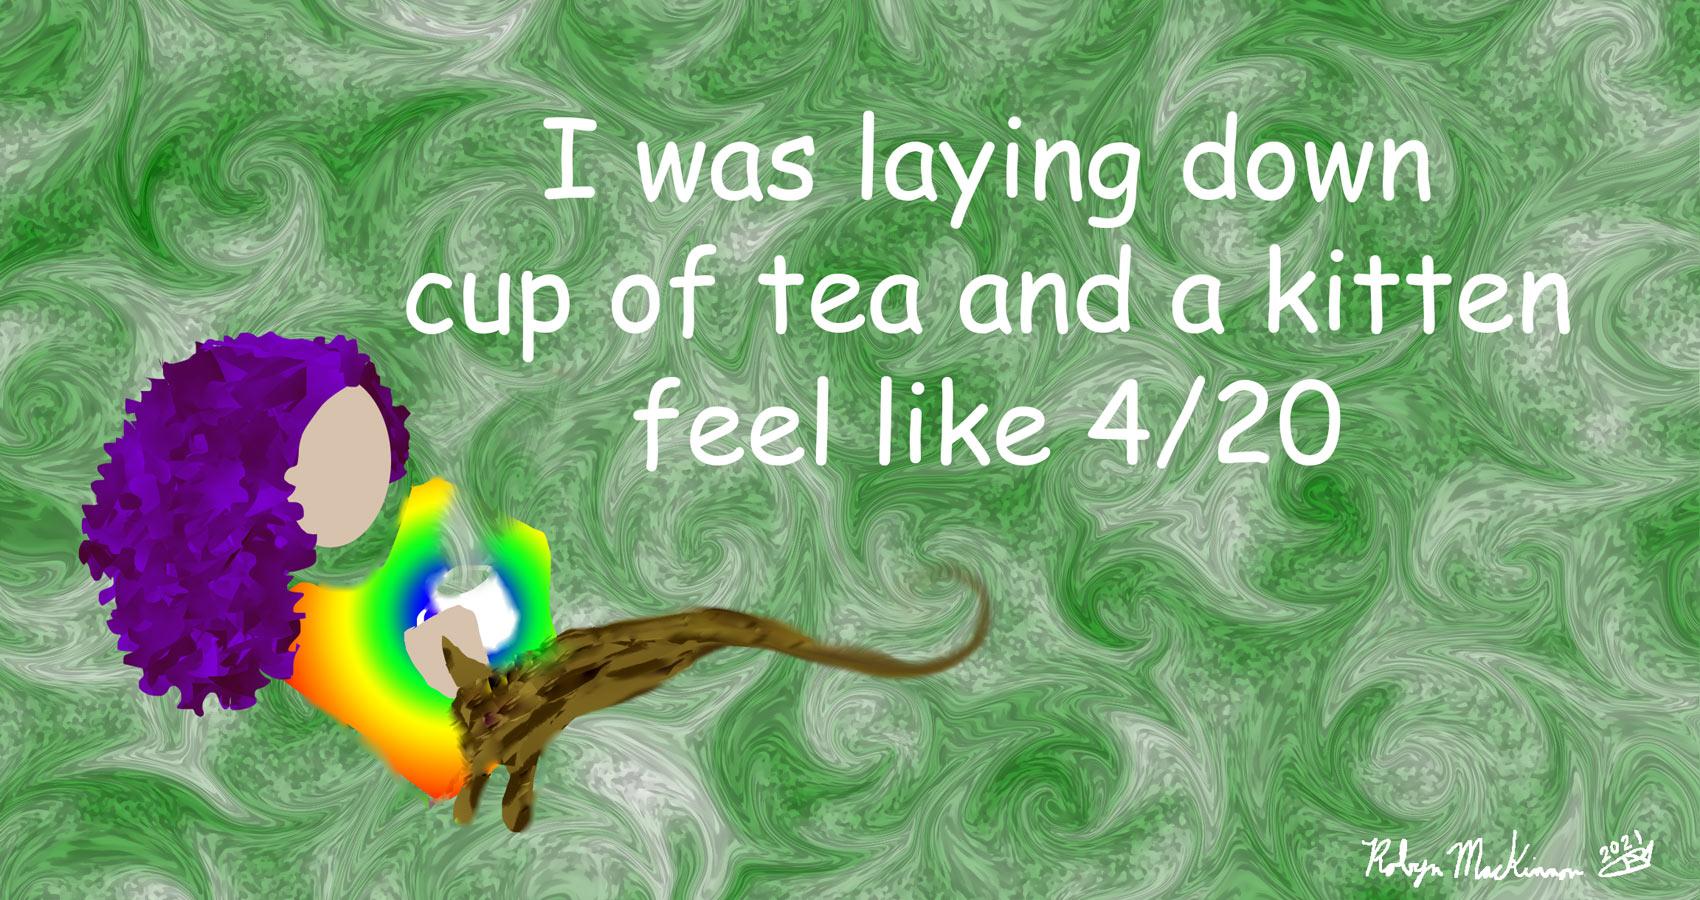 420 Feels, haiku by Robyn MacKinnon at Spillwords.com